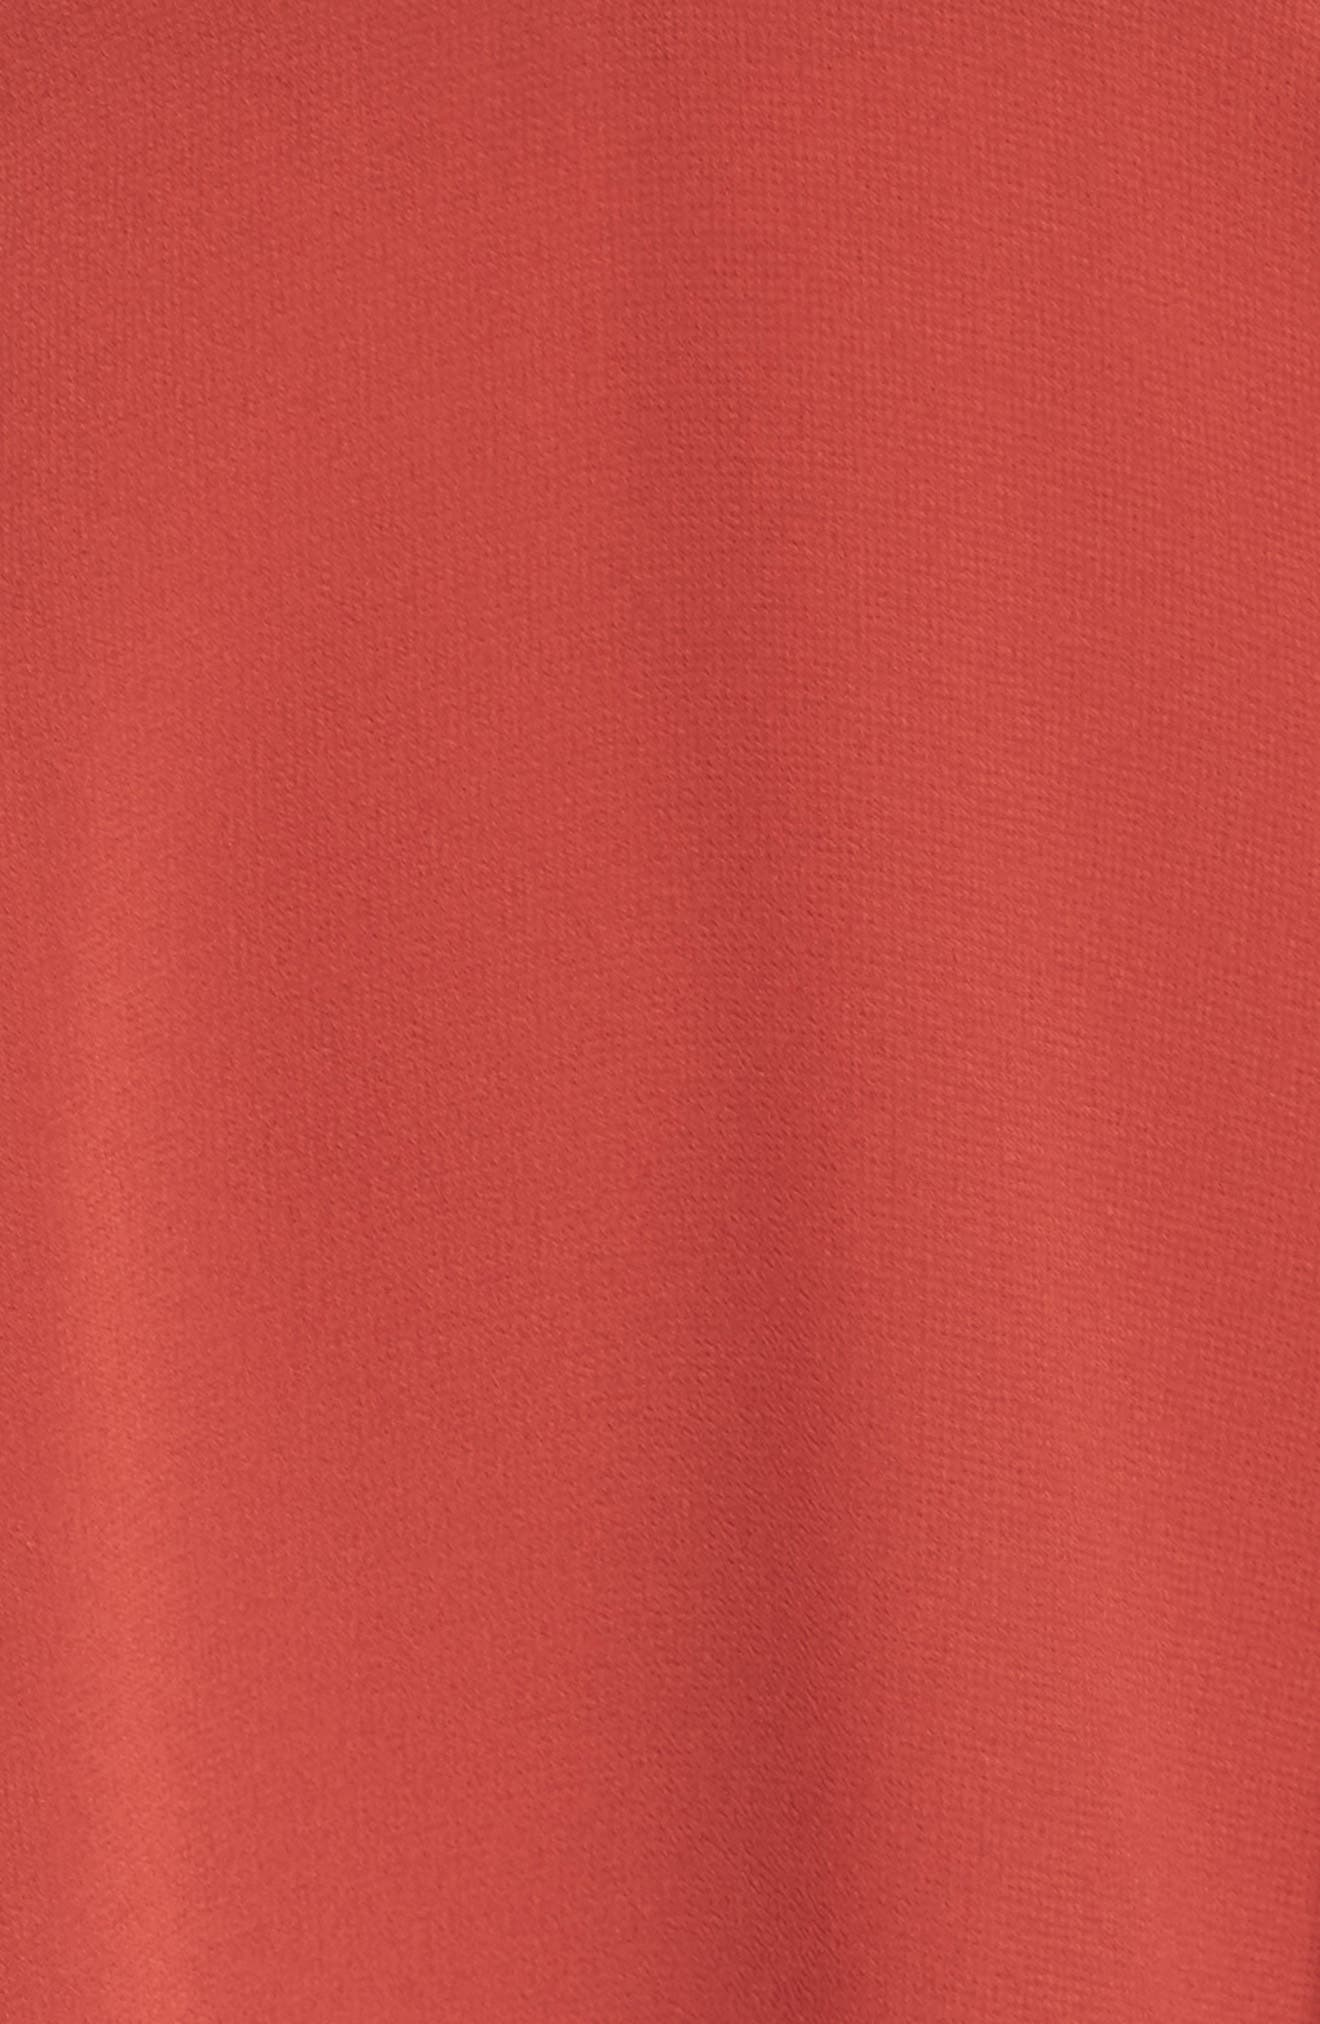 El Cid Tie Front Minidress,                             Alternate thumbnail 5, color,